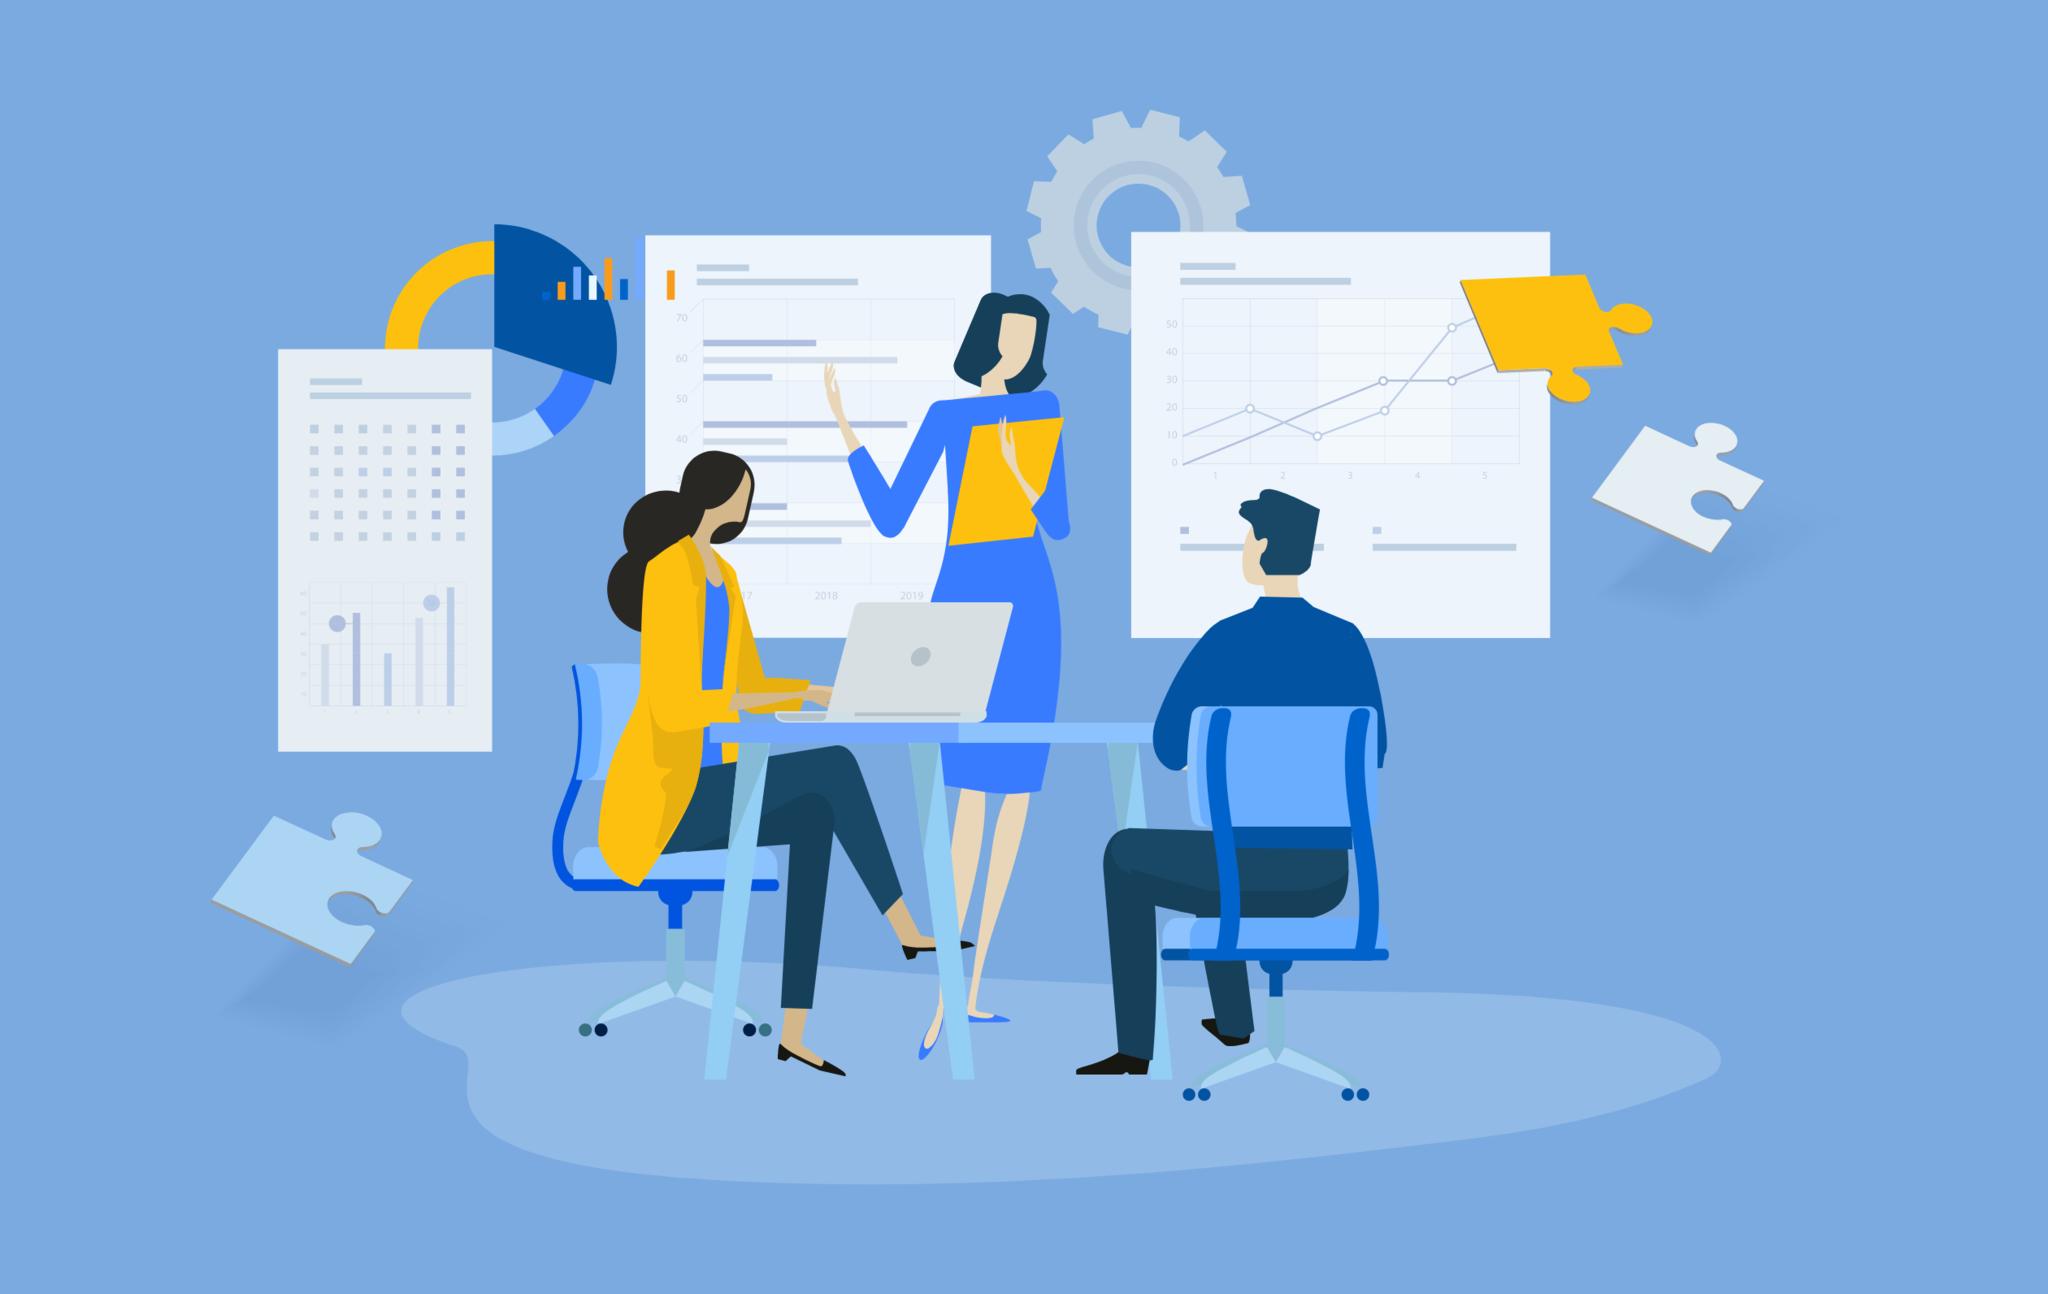 Illustration of an ecommerce marketing team